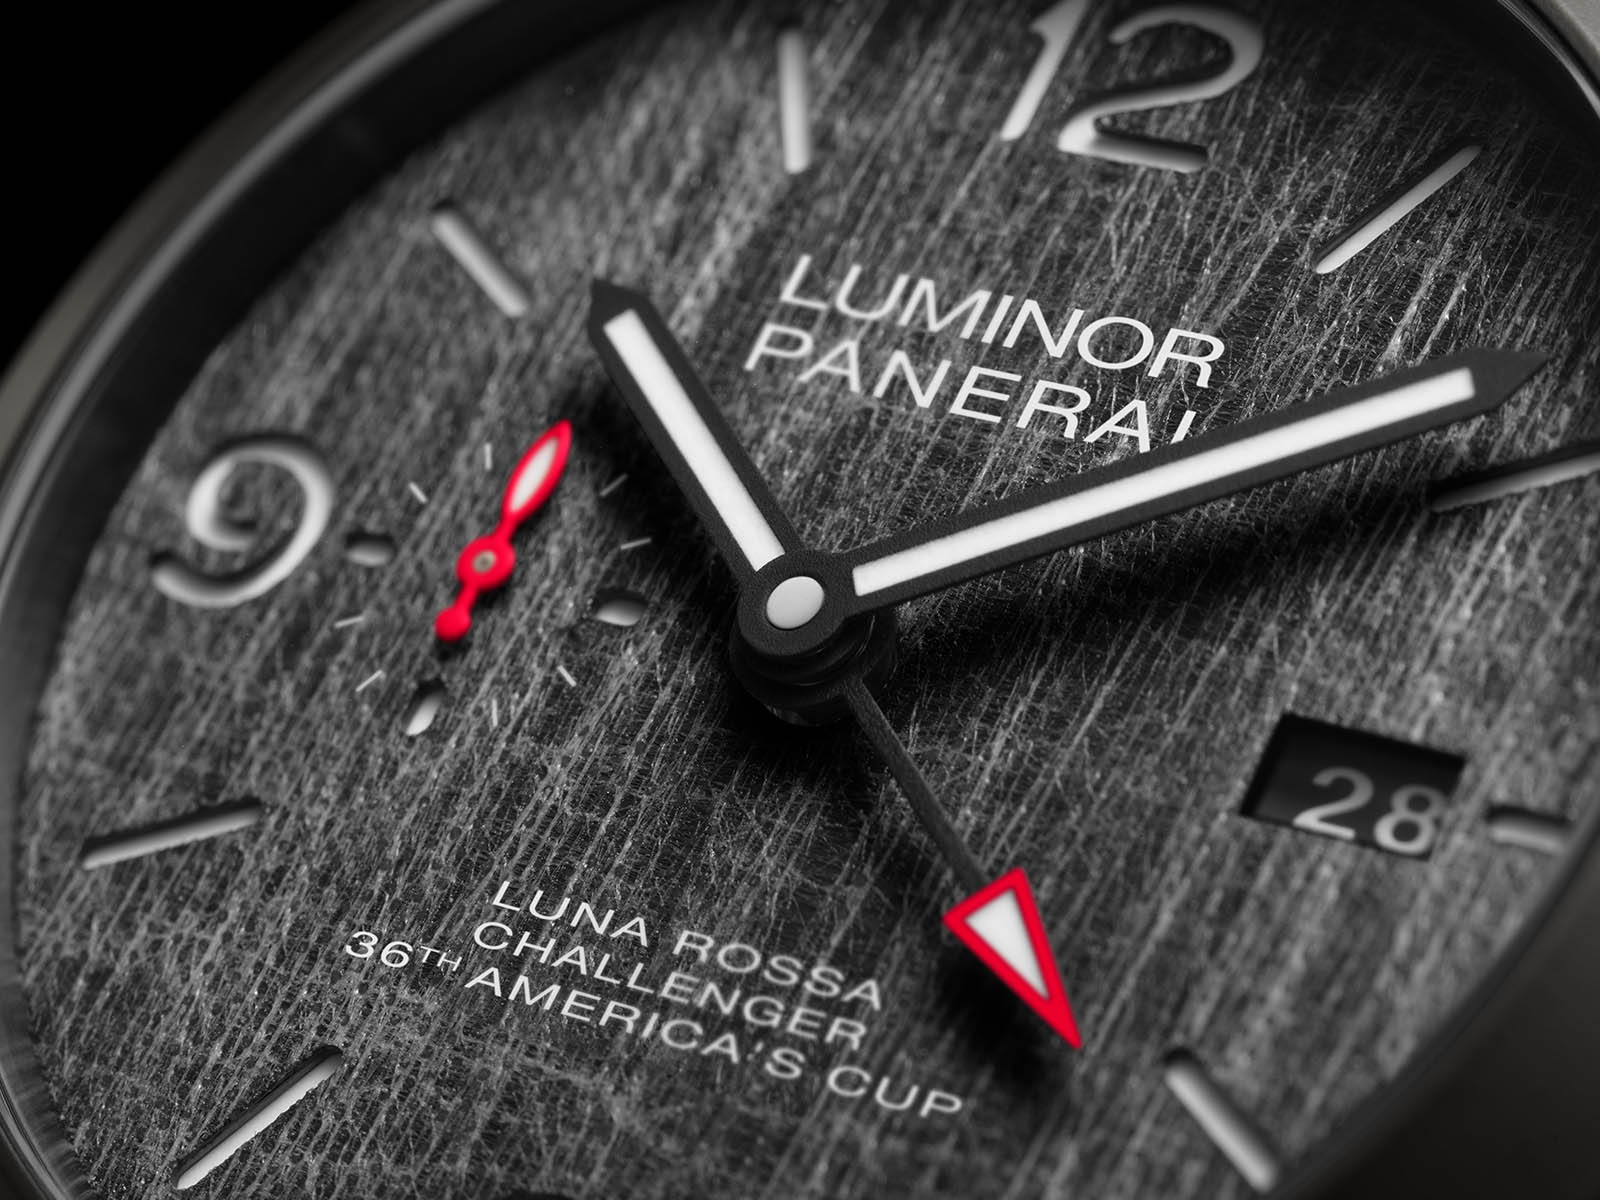 pam01036-officine-panerai-luminor-luna-rossa-gmt-44mm-3.jpg